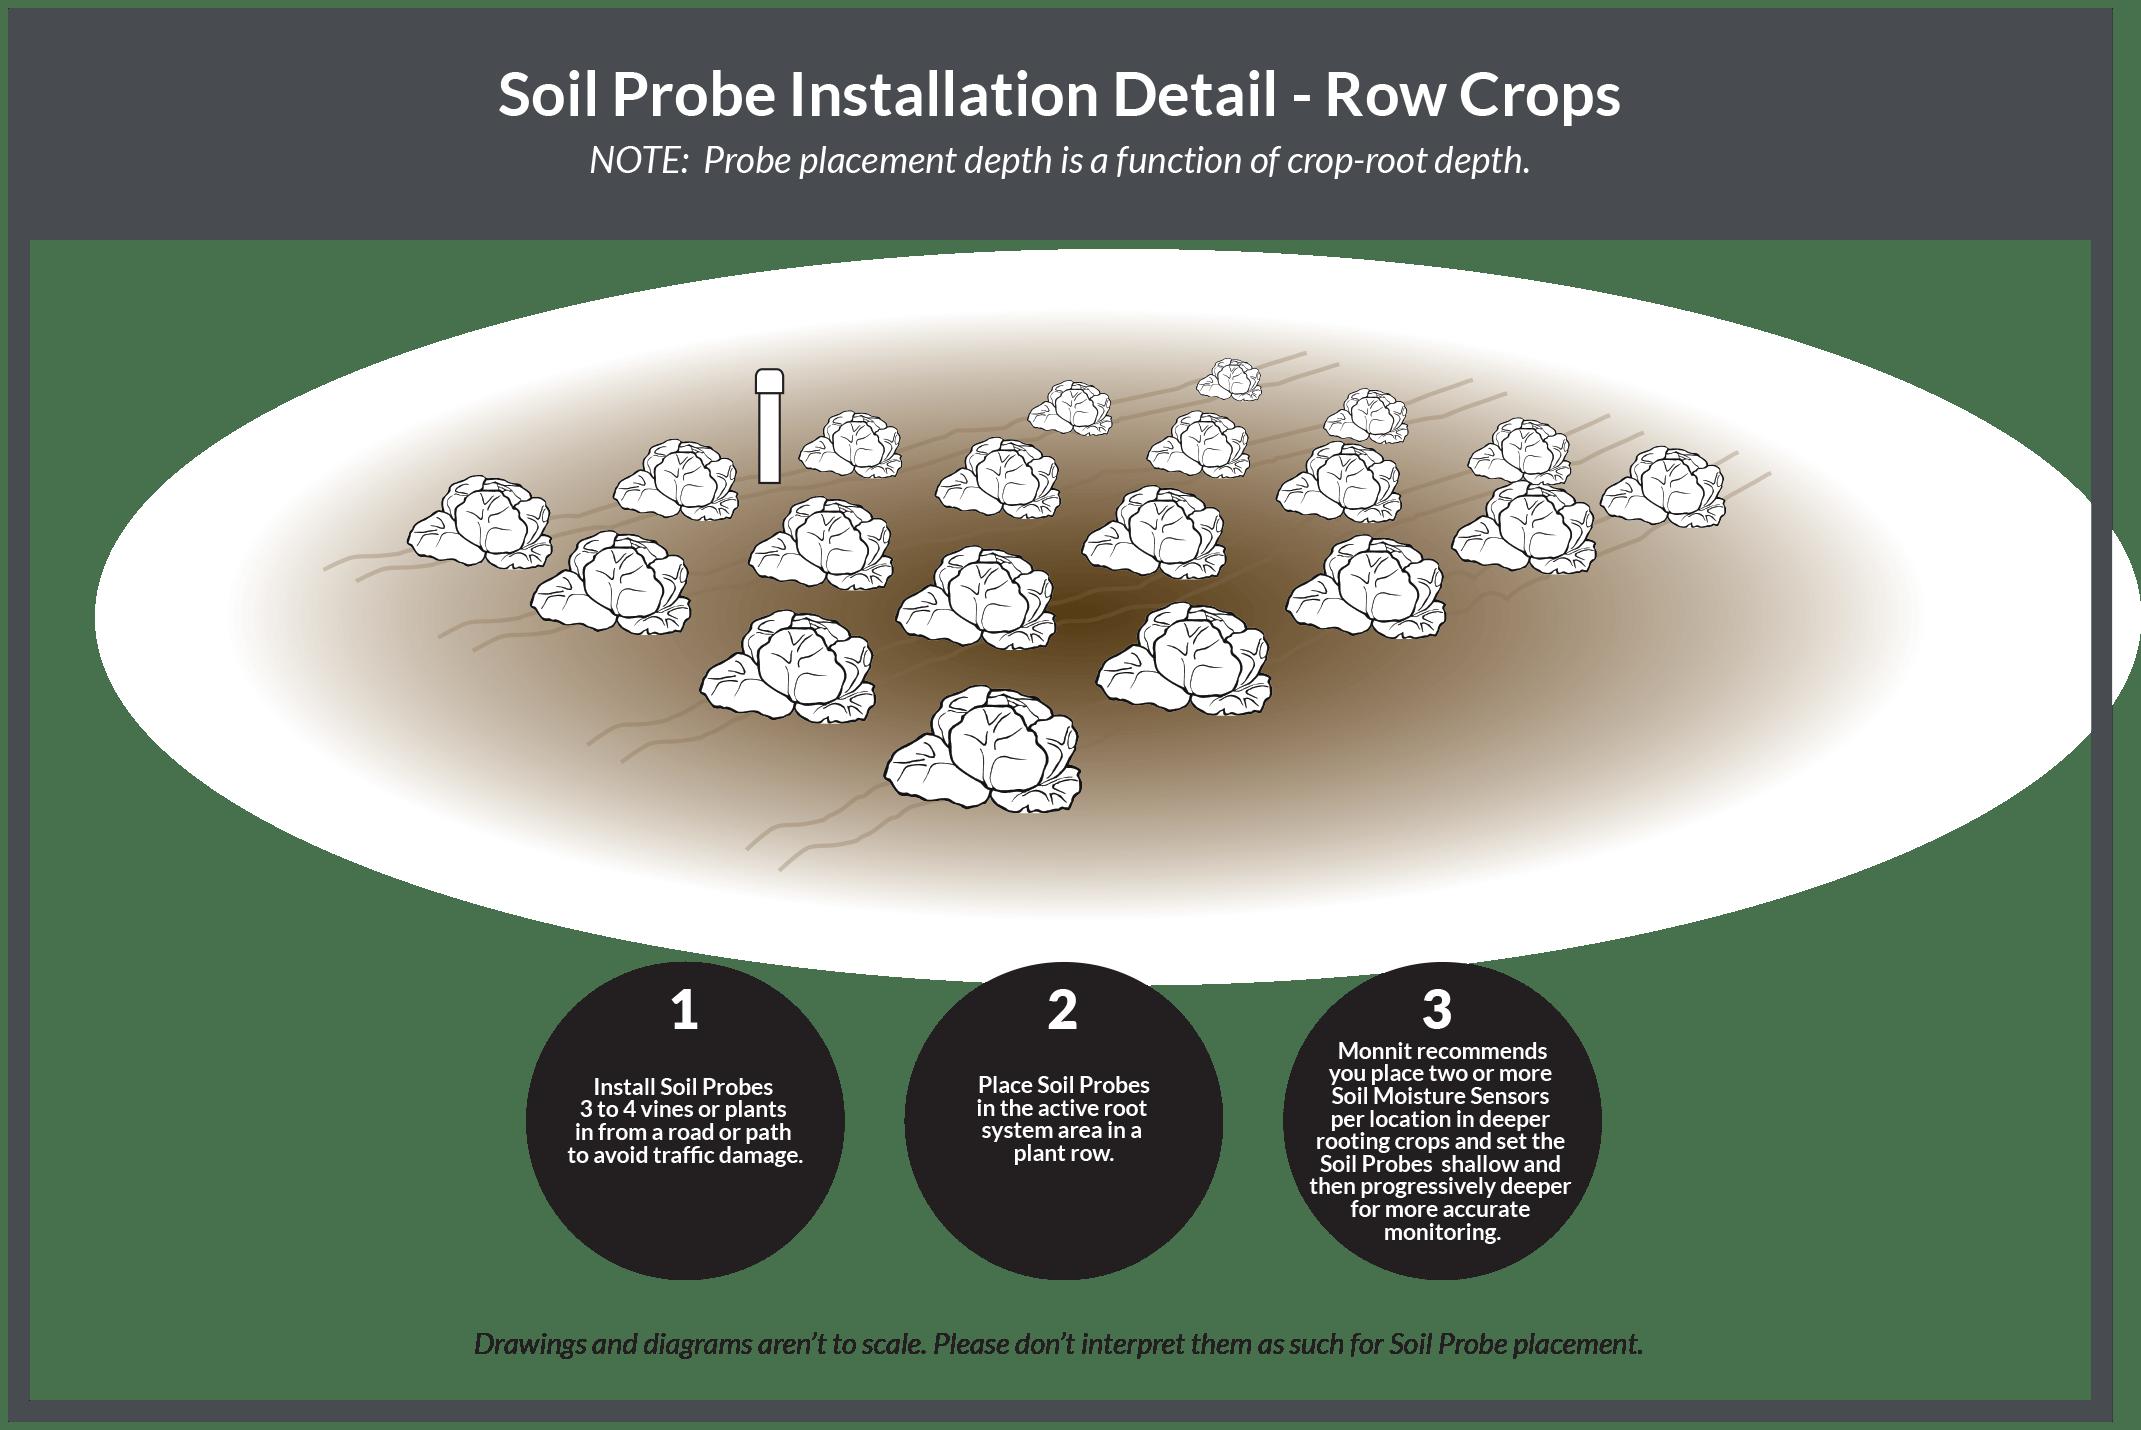 row crops installation